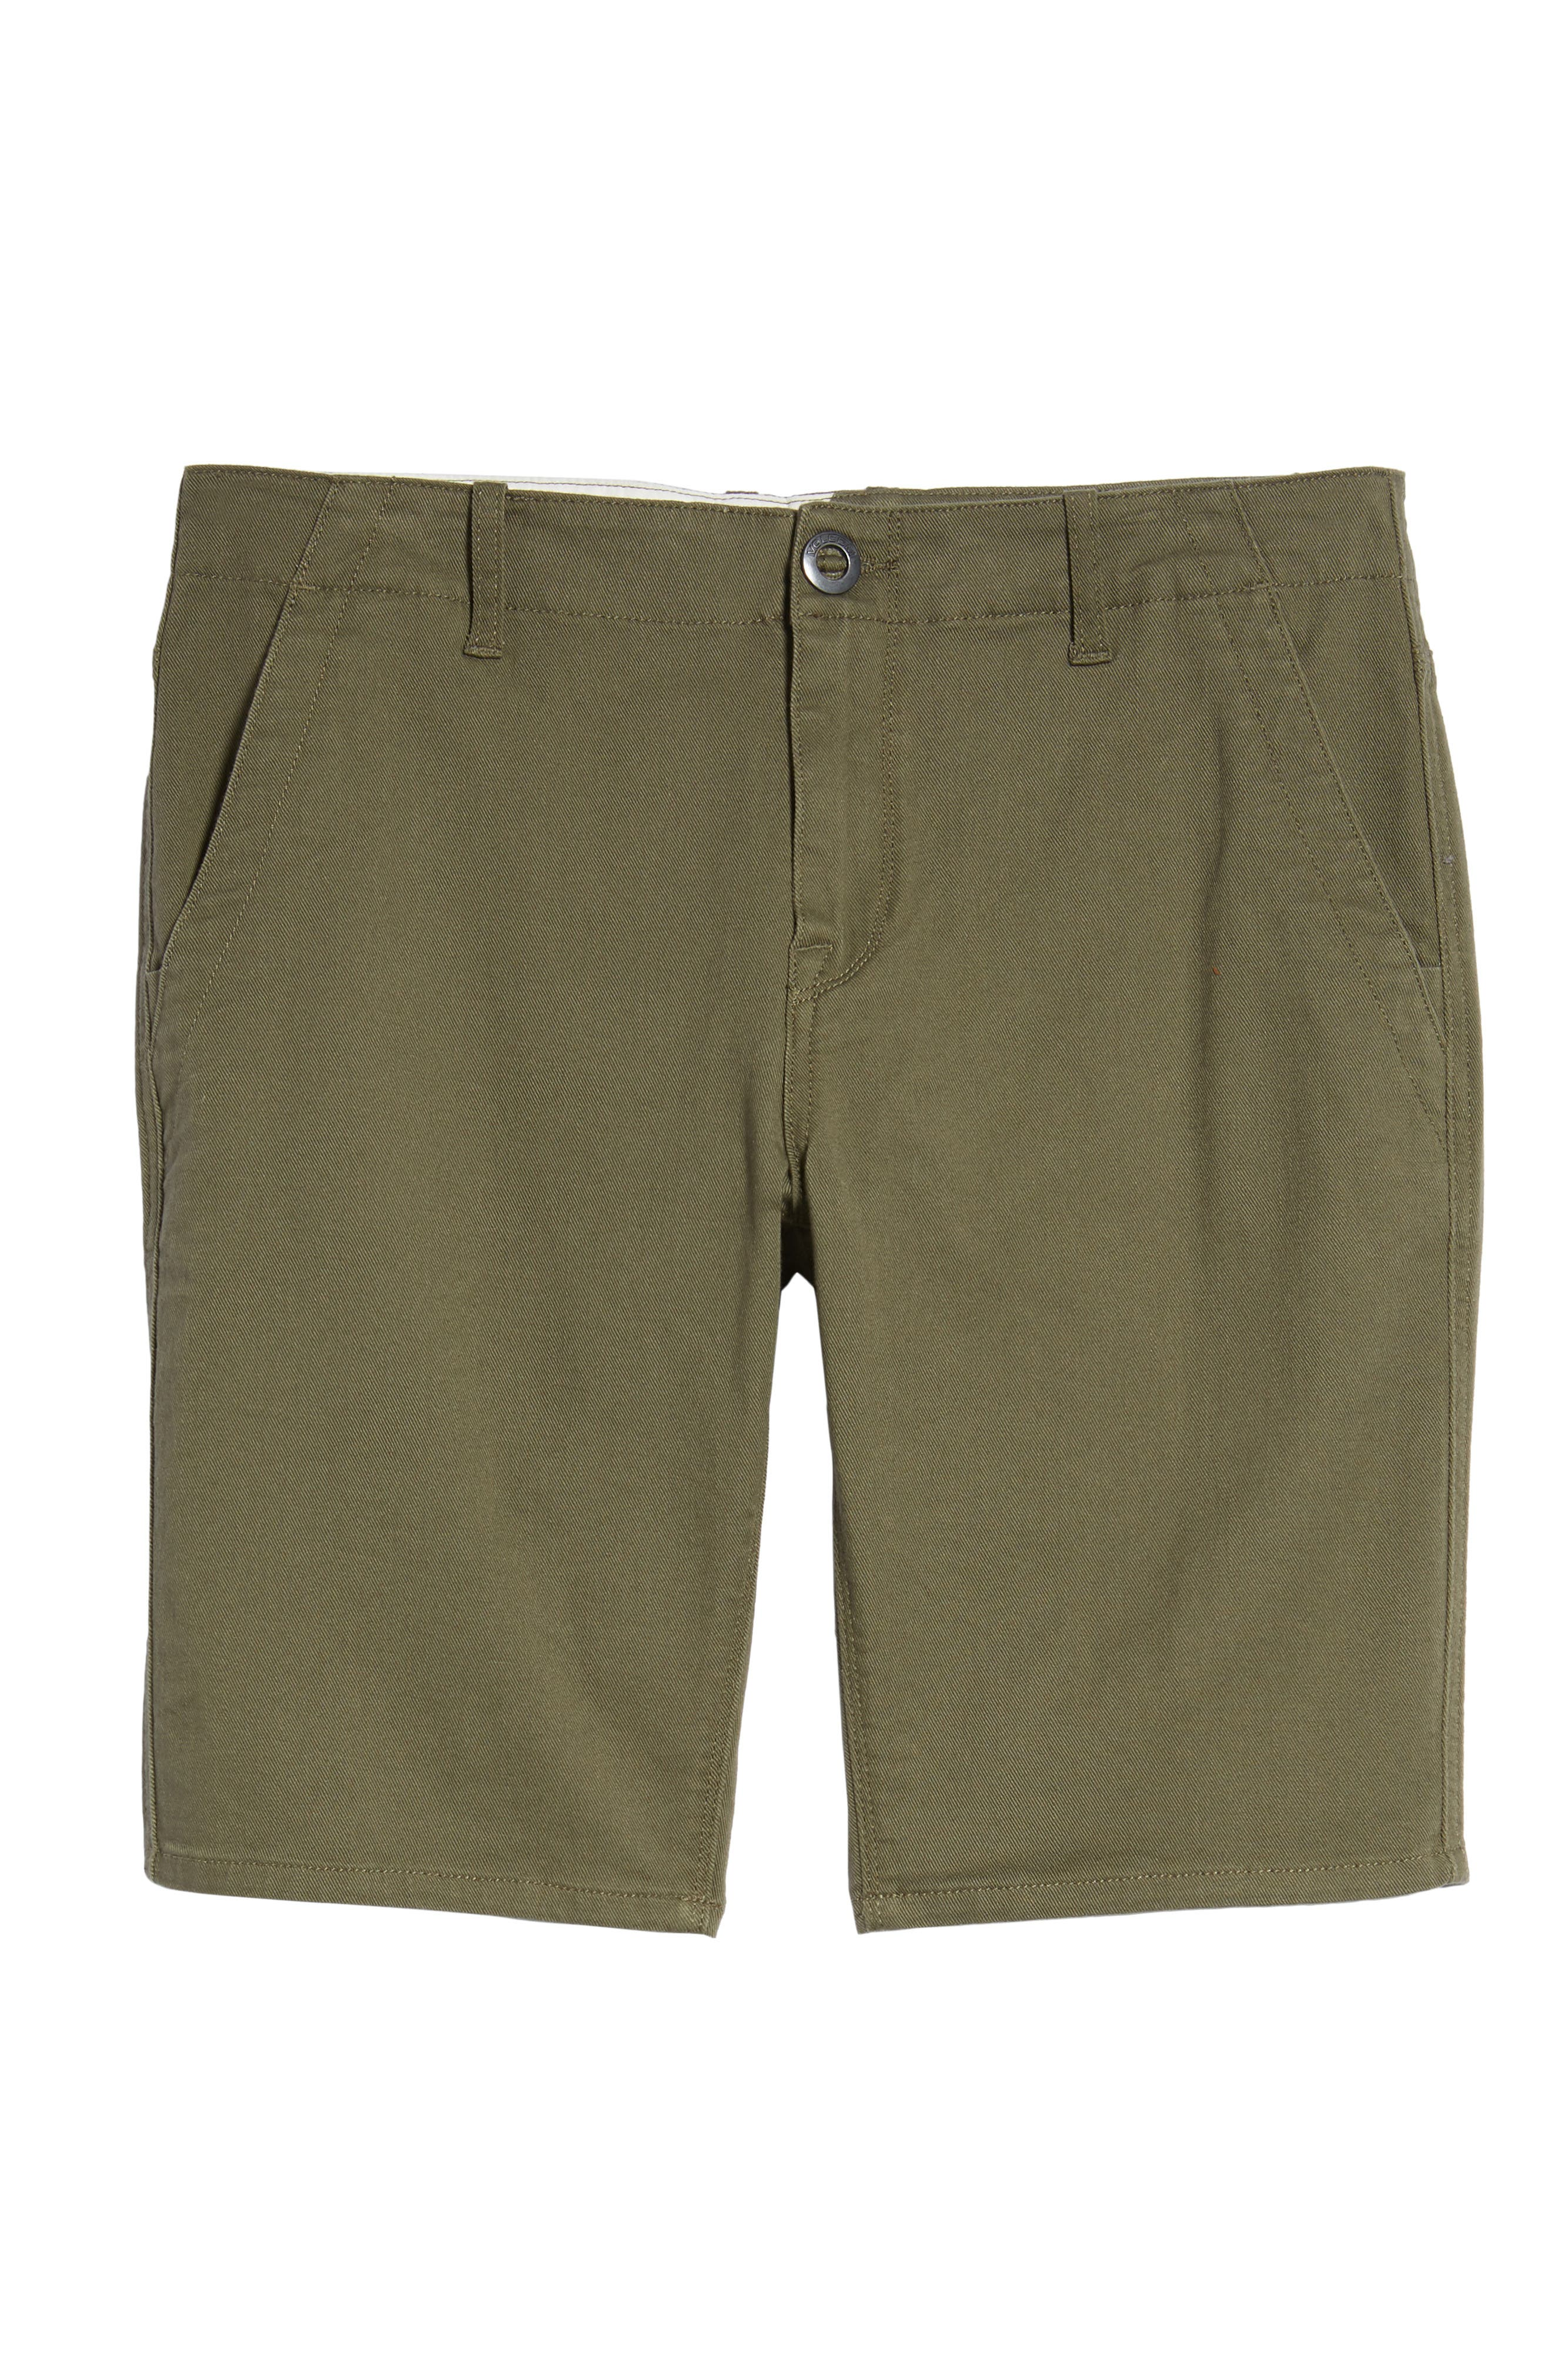 VSM Prowler Shorts,                             Alternate thumbnail 18, color,